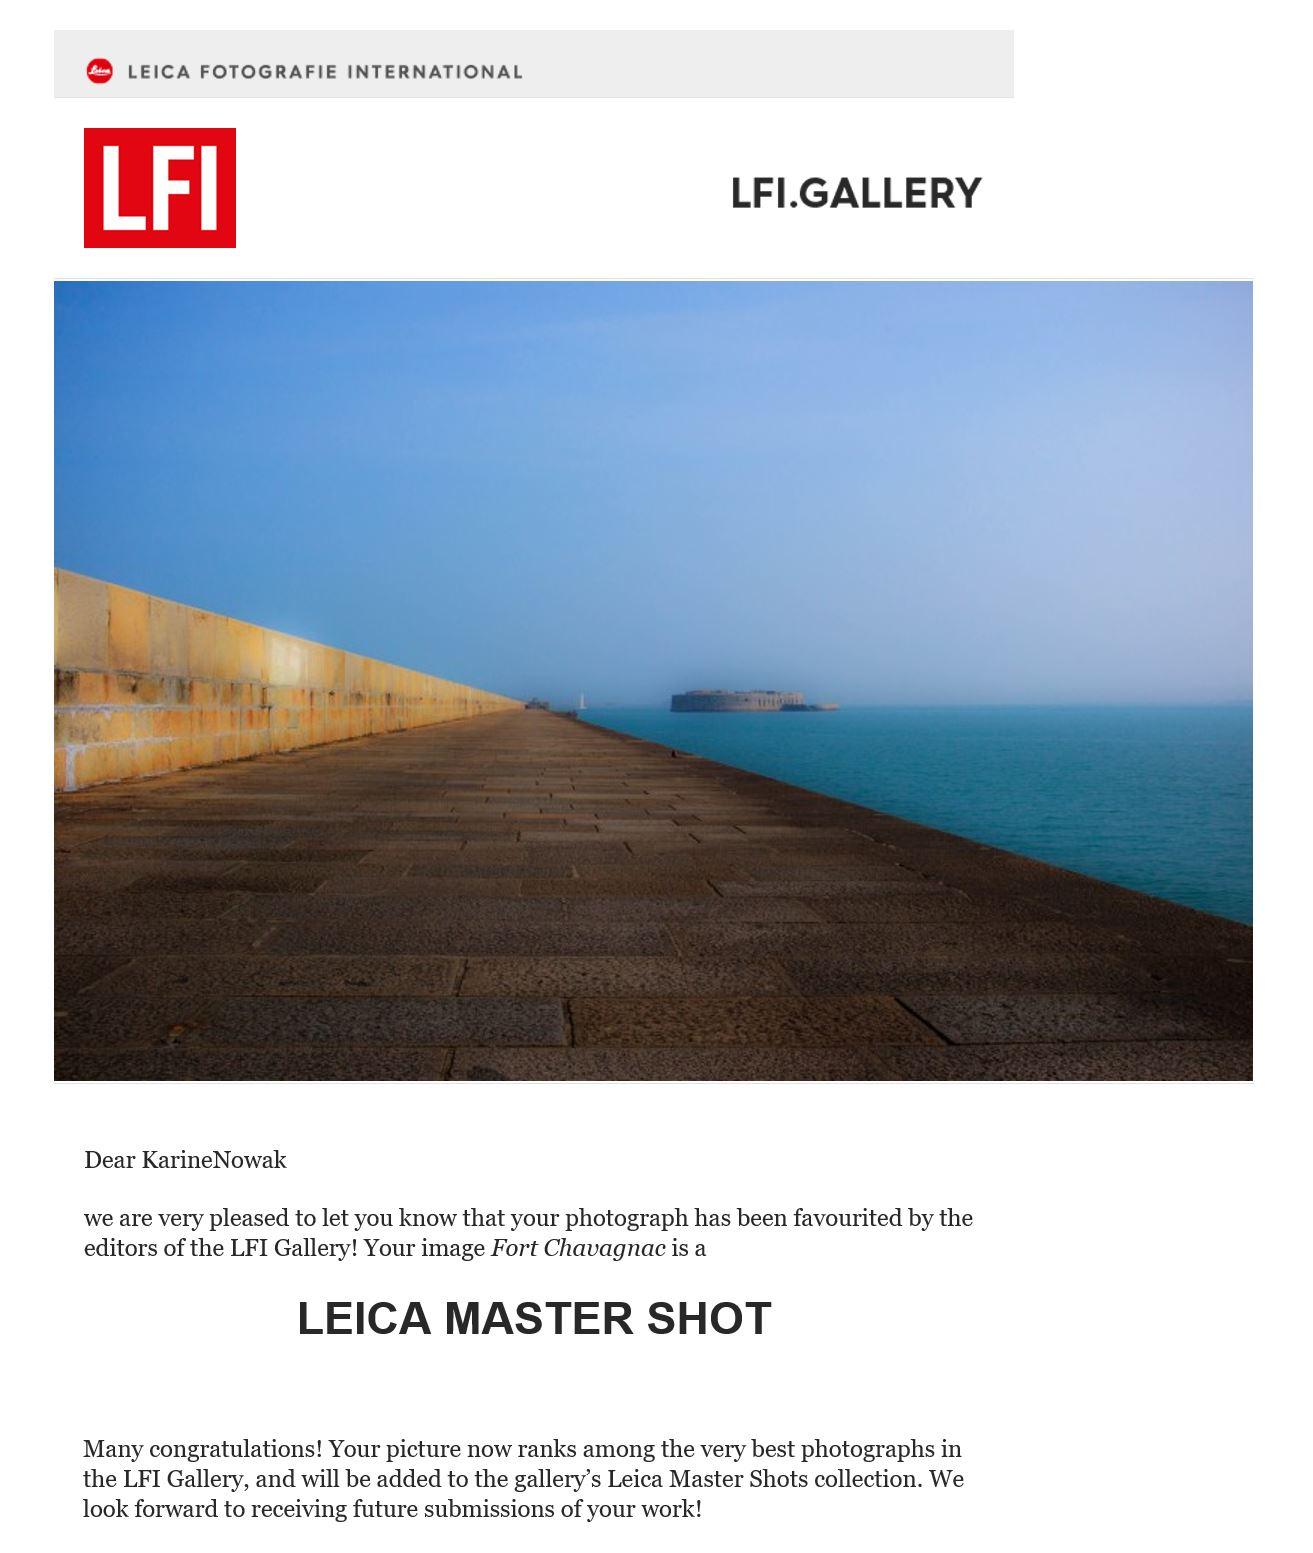 Leica Fotografie International Karine Nowak